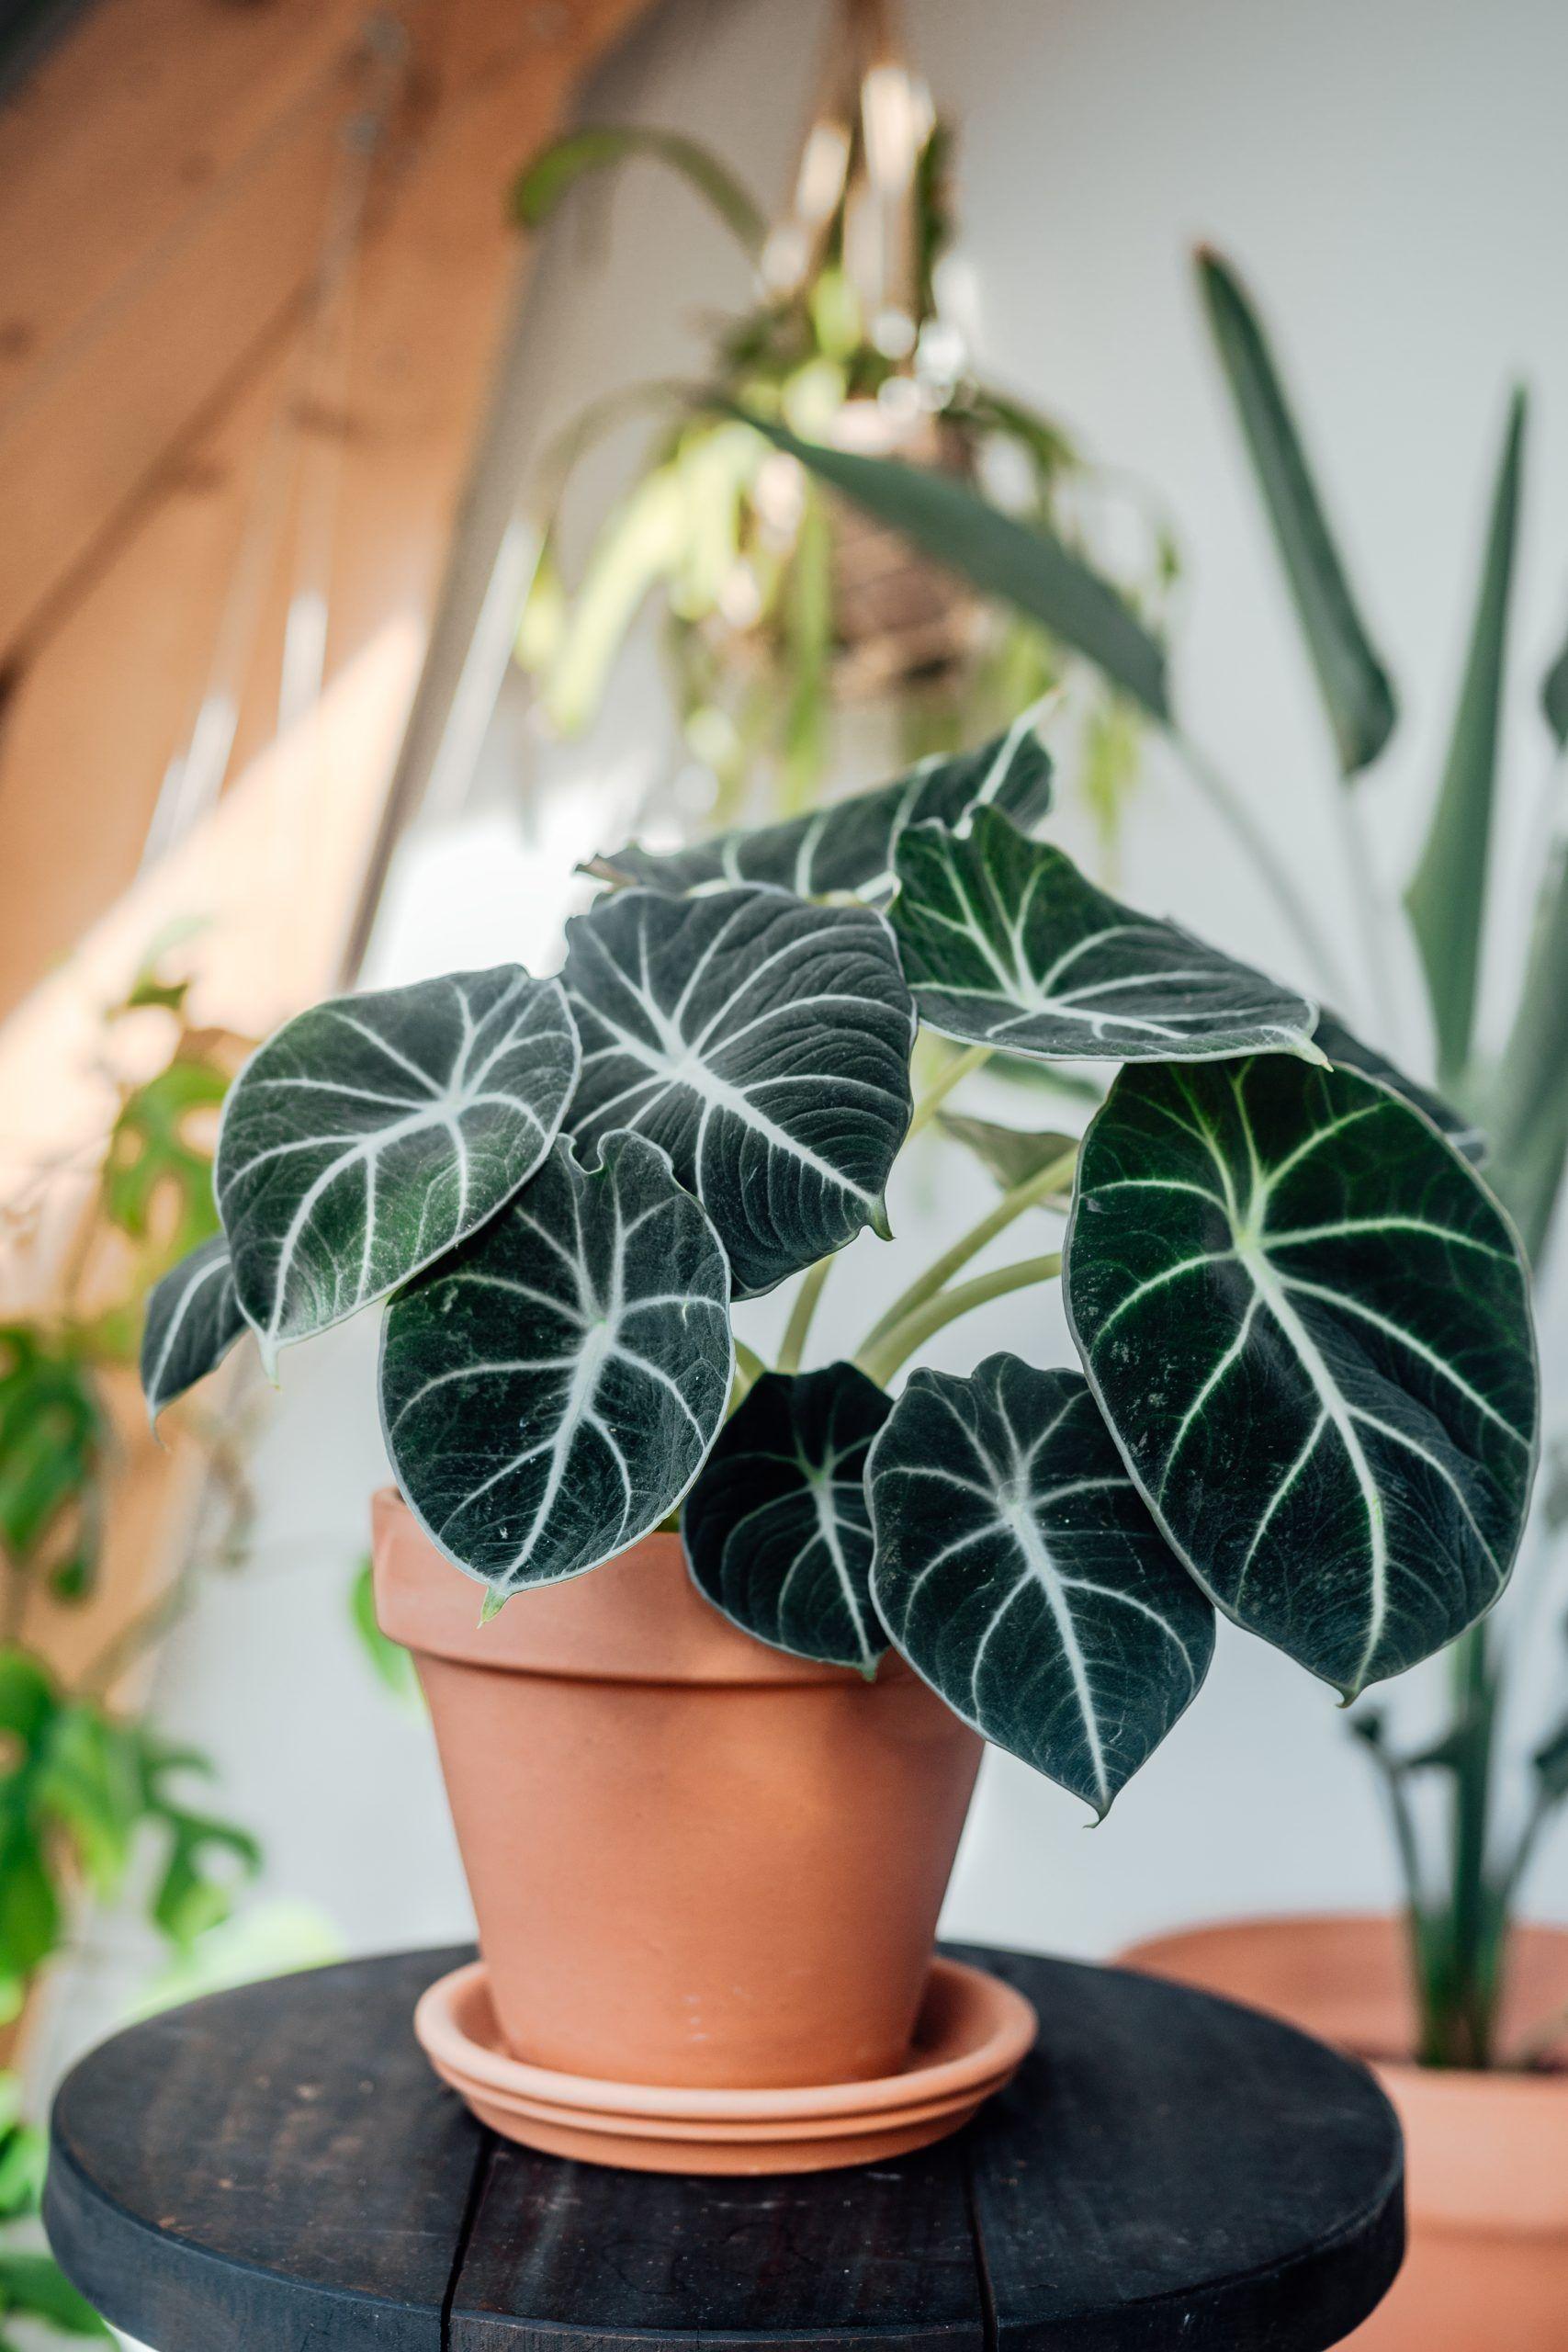 Rare Unusual House Plants